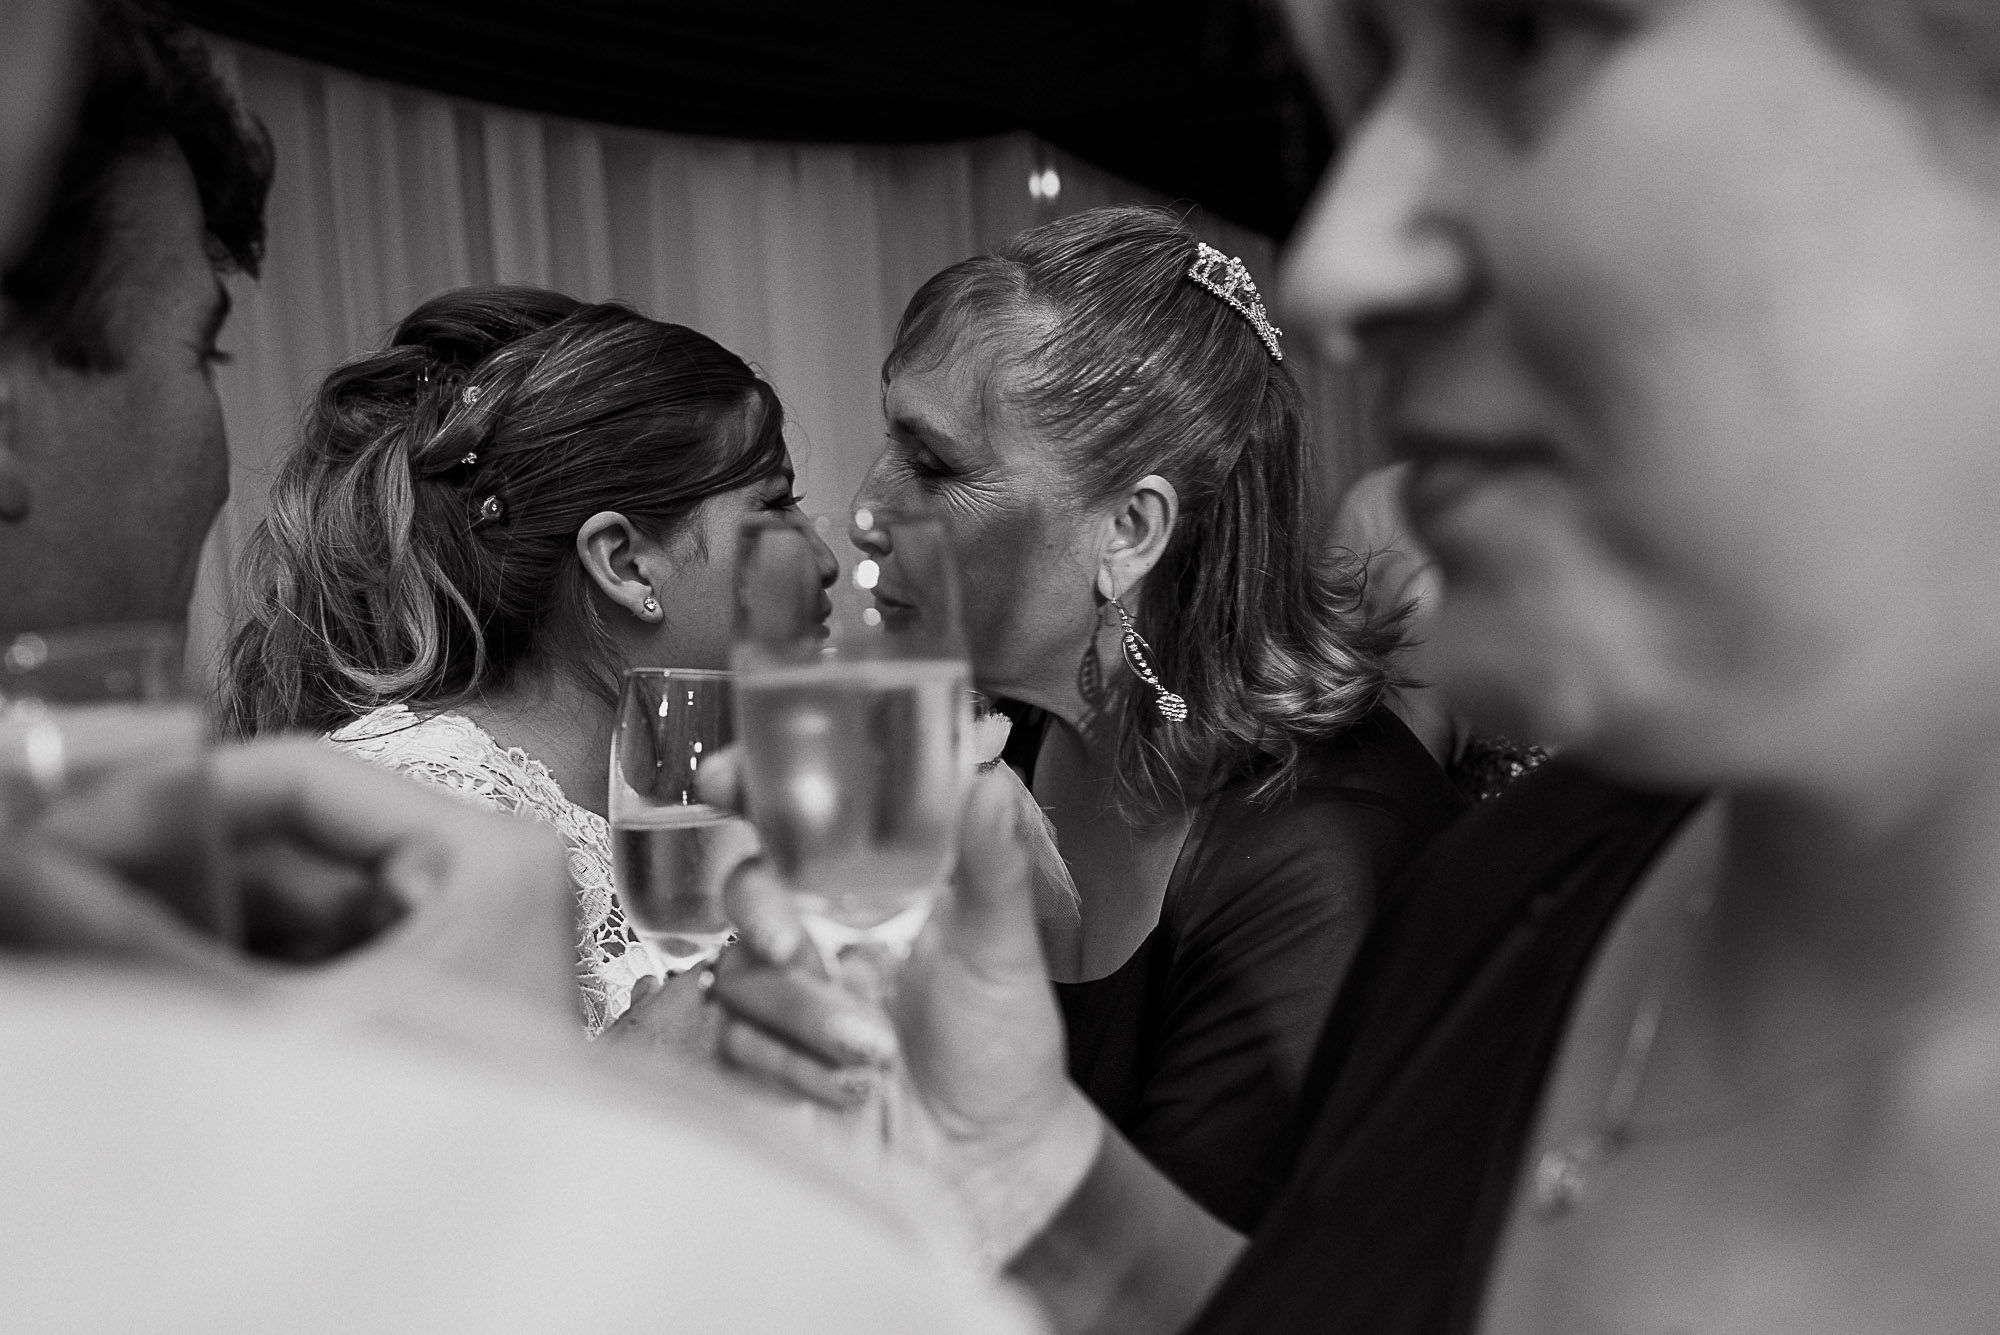 boda-vero-raul-patagonia-argentina-chilena-fotografo-de-bodas-argentina-casamiento-en-patagonia-gabriel-roa-photography-22